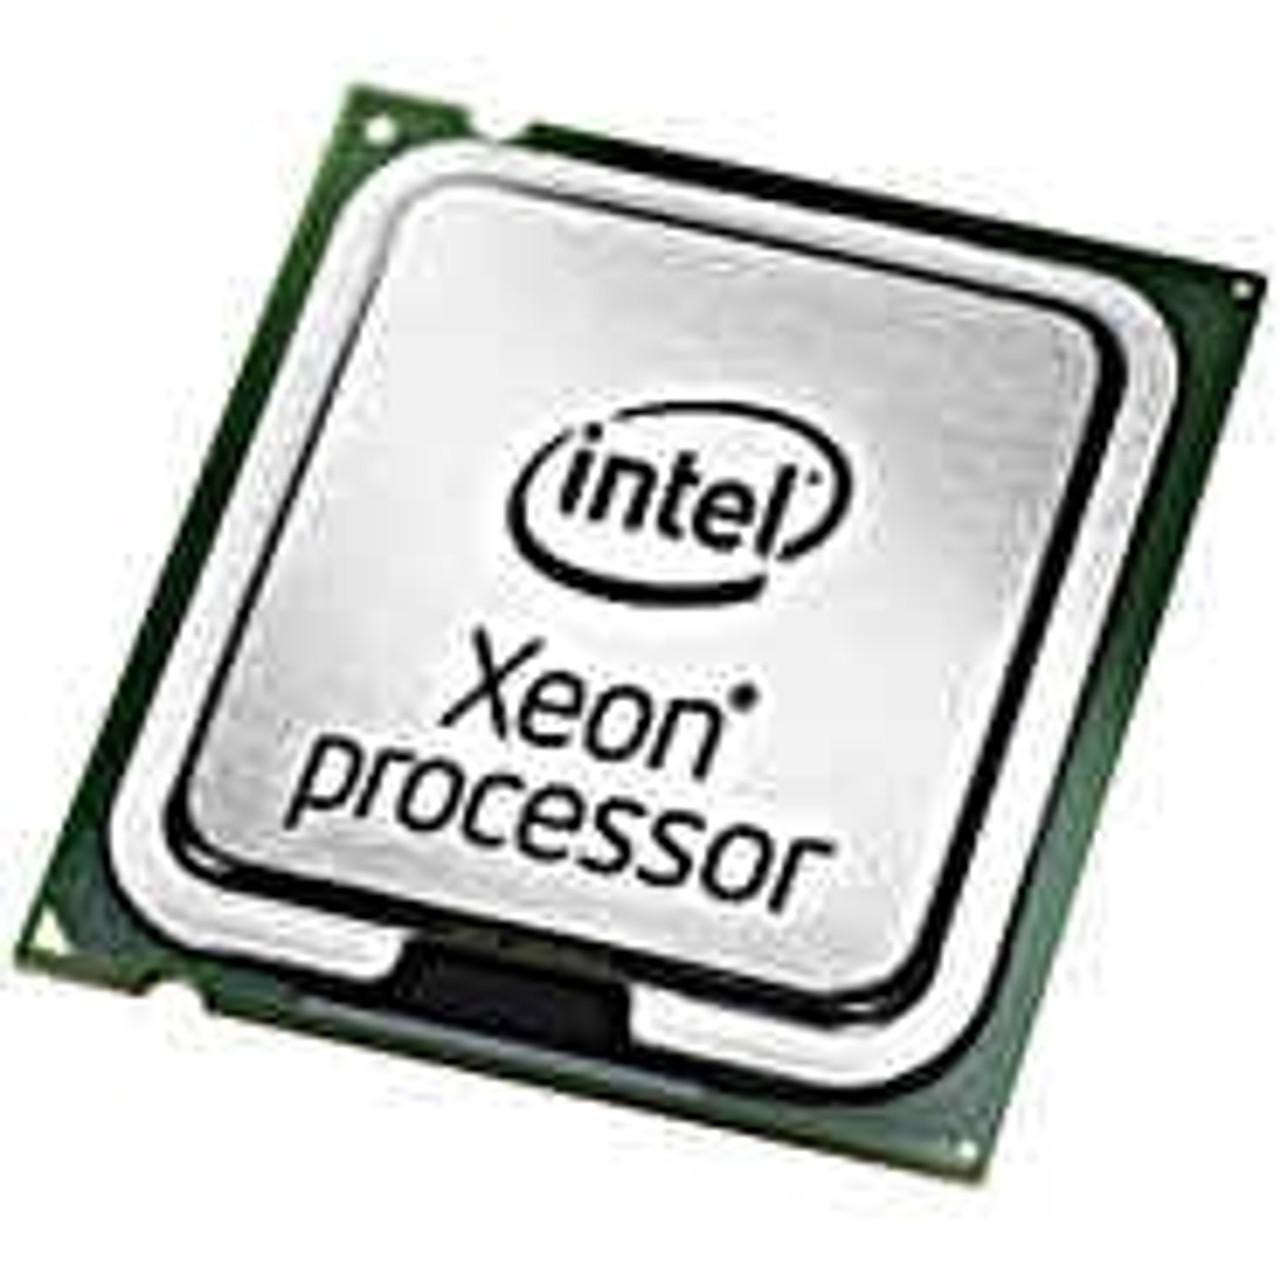 Intel Xeon 5000/5100 Dual-Core CPUs